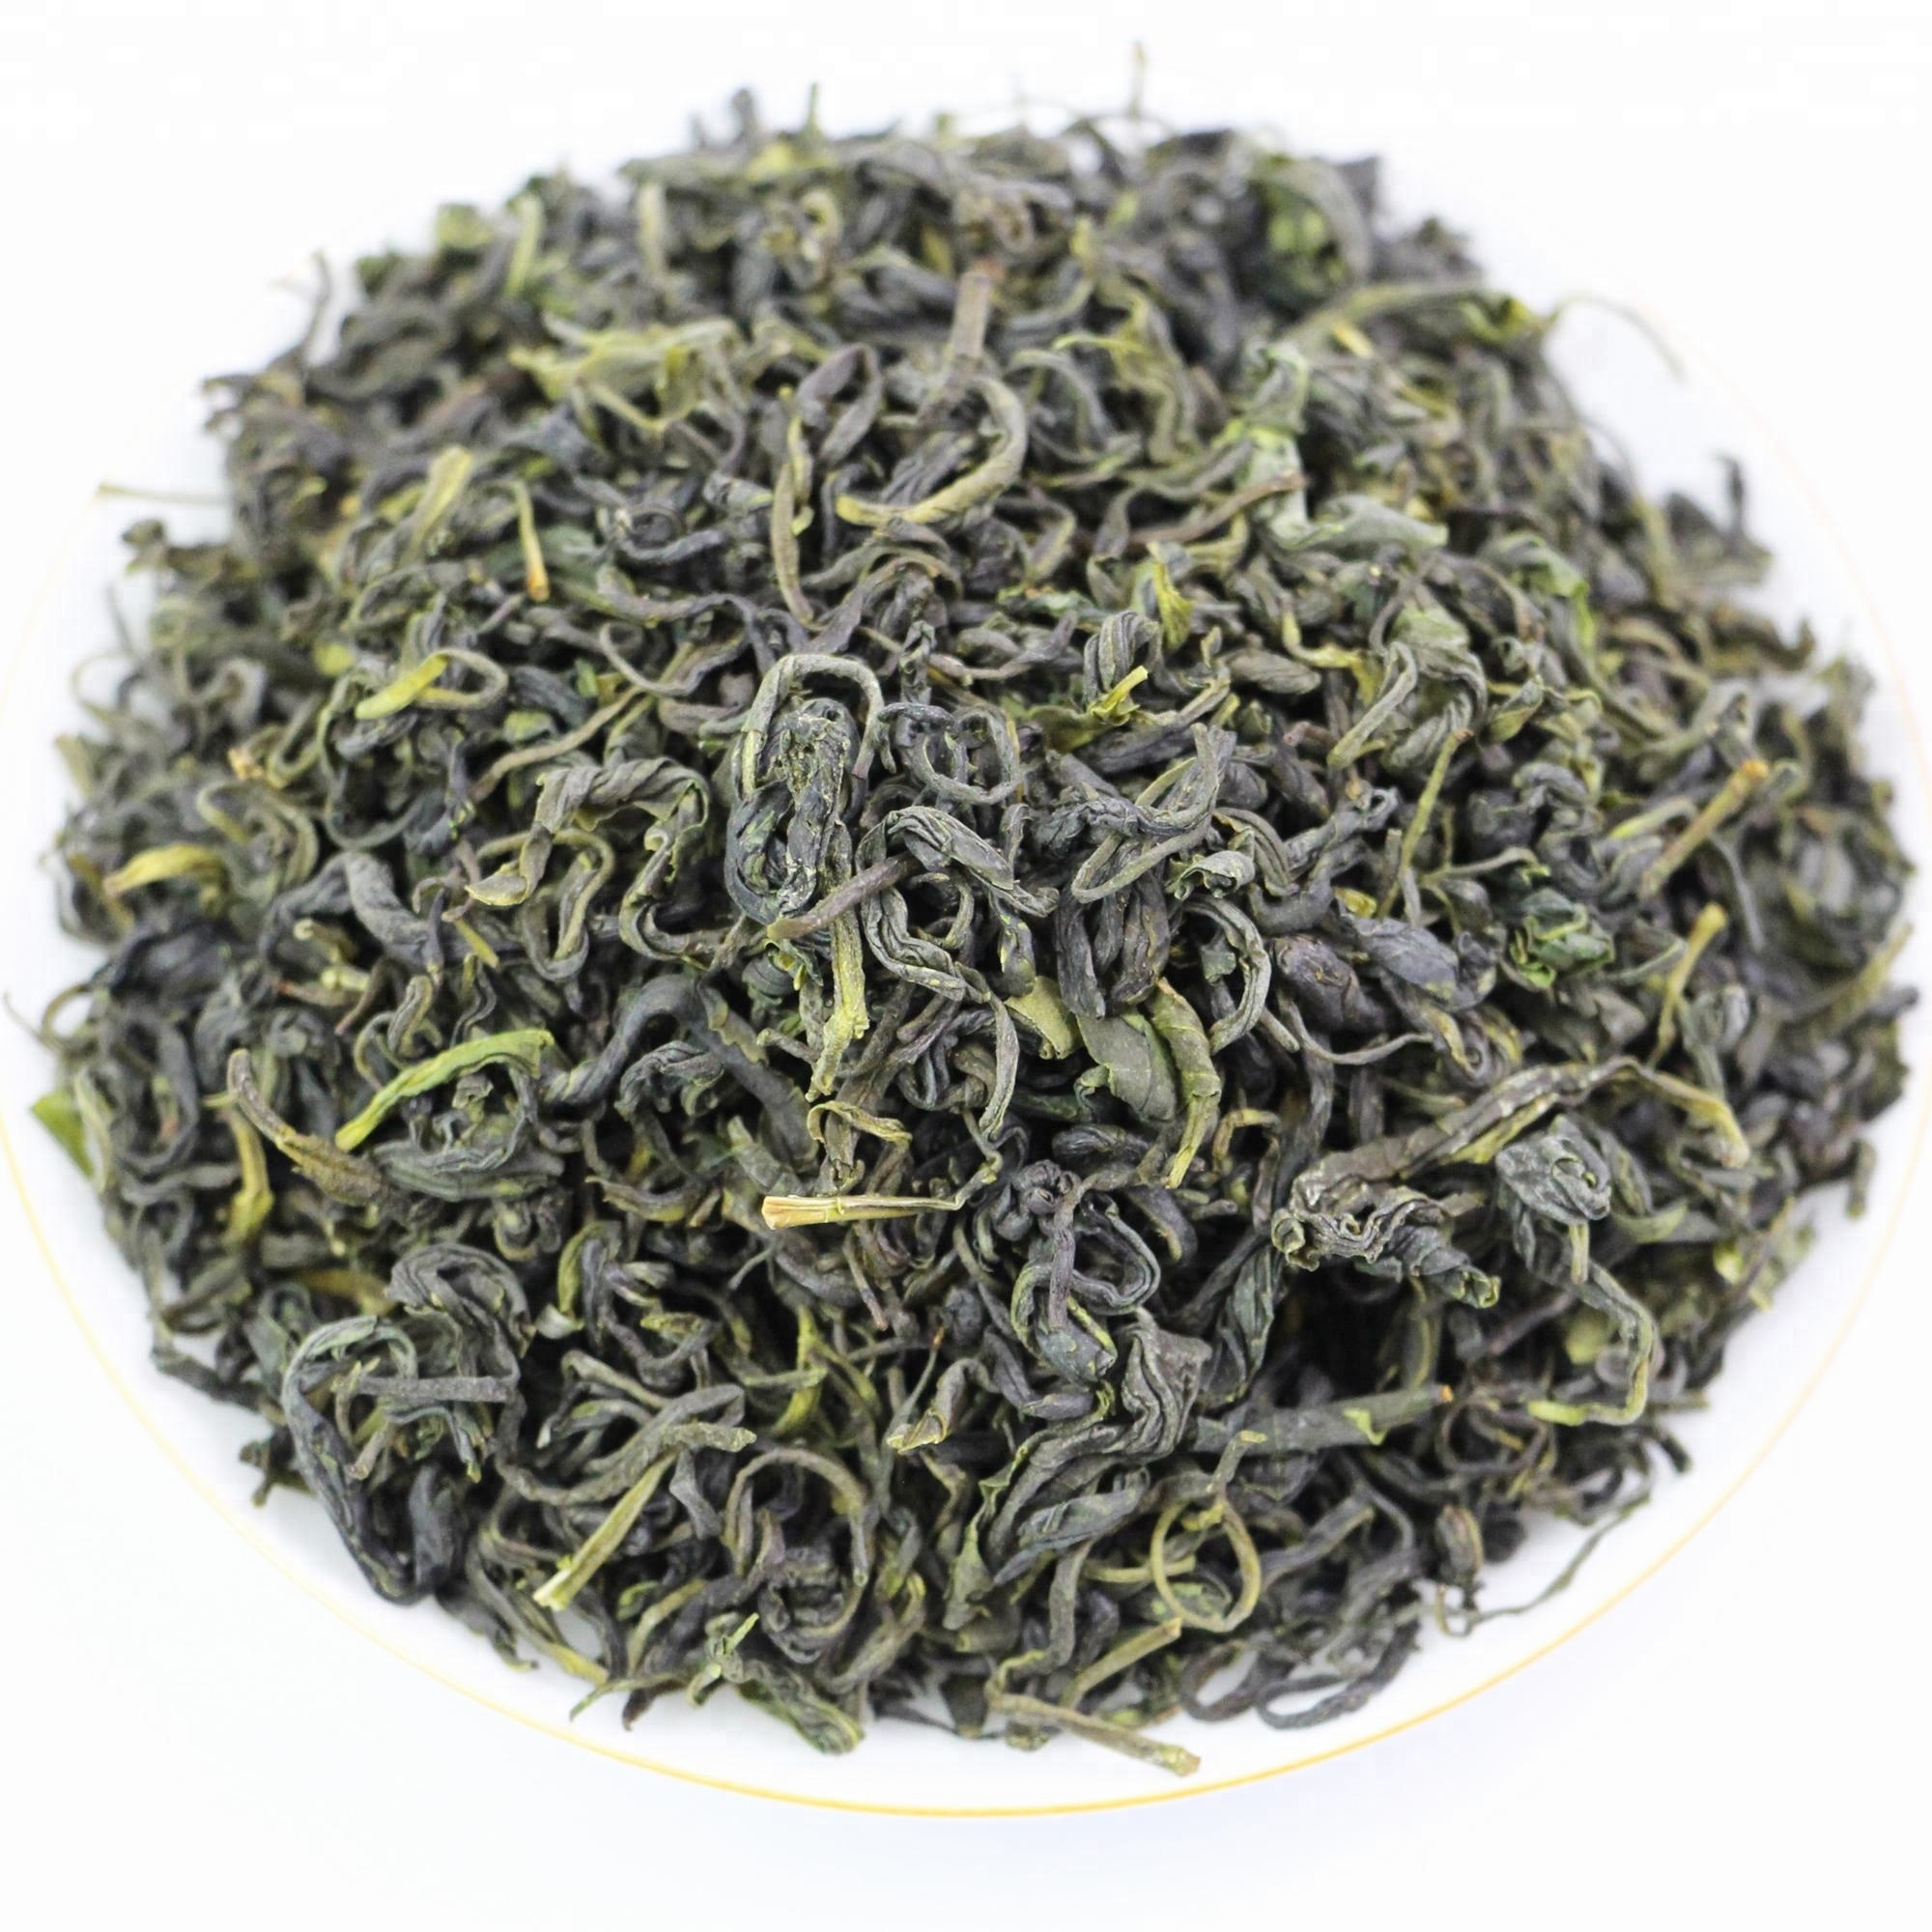 Tea online shop tea private label orthodox green tea - 4uTea | 4uTea.com